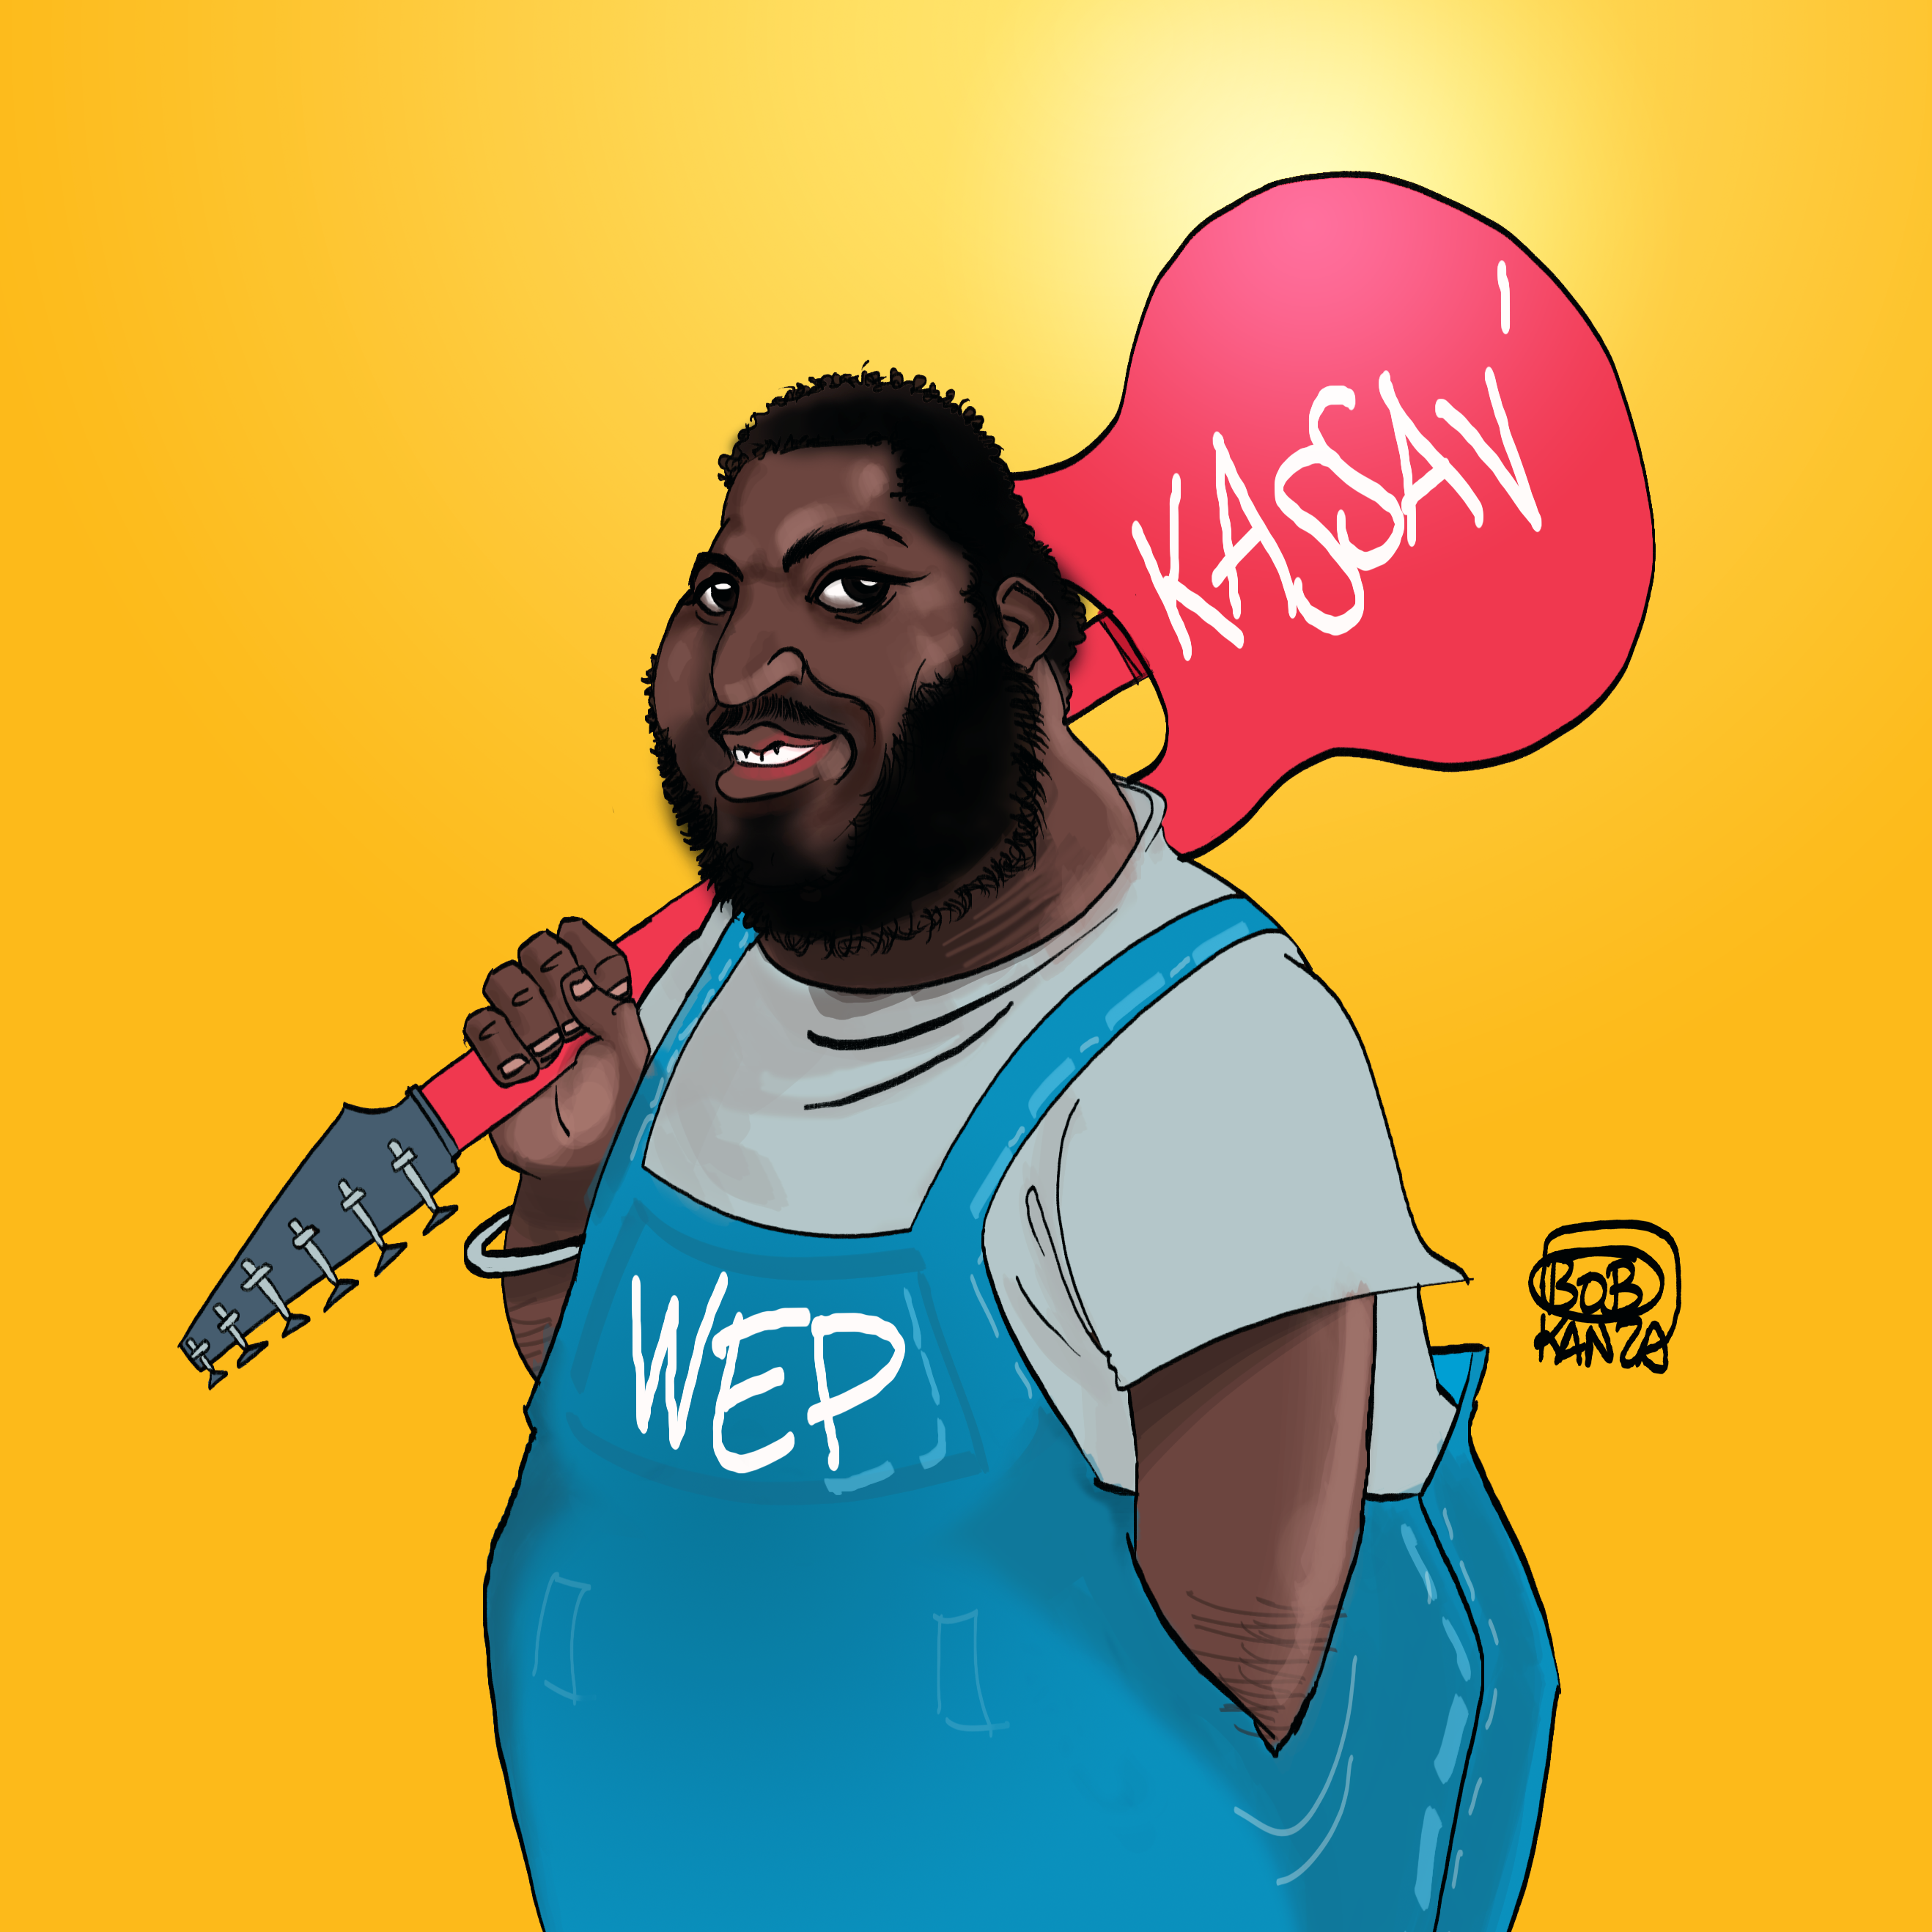 jacob desvarieux kassav caricature bob kanza